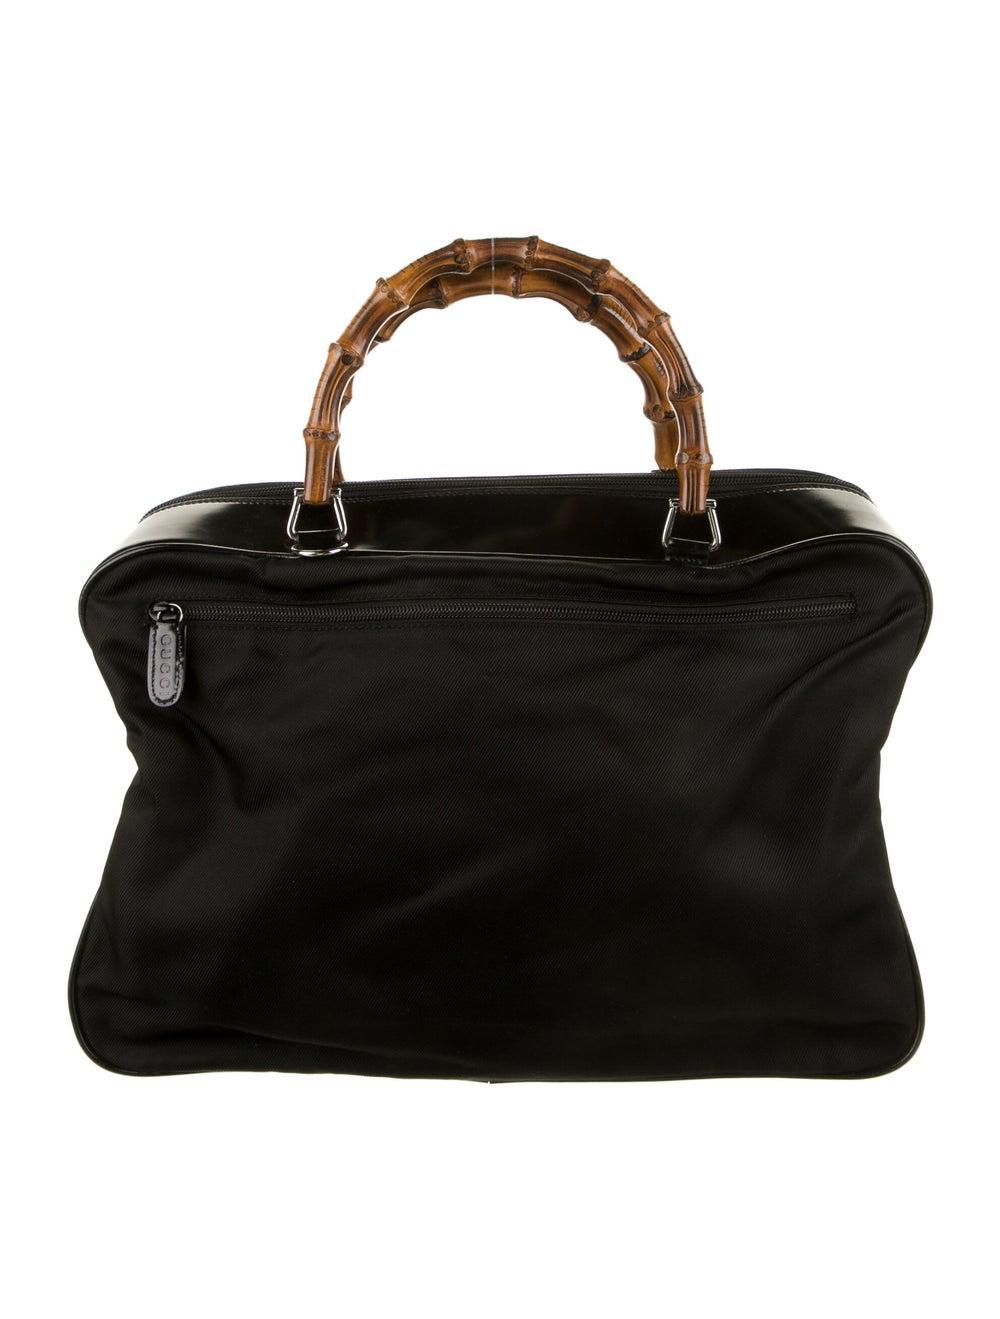 Gucci Vintage Nylon Bamboo Handle Bag Black - image 4